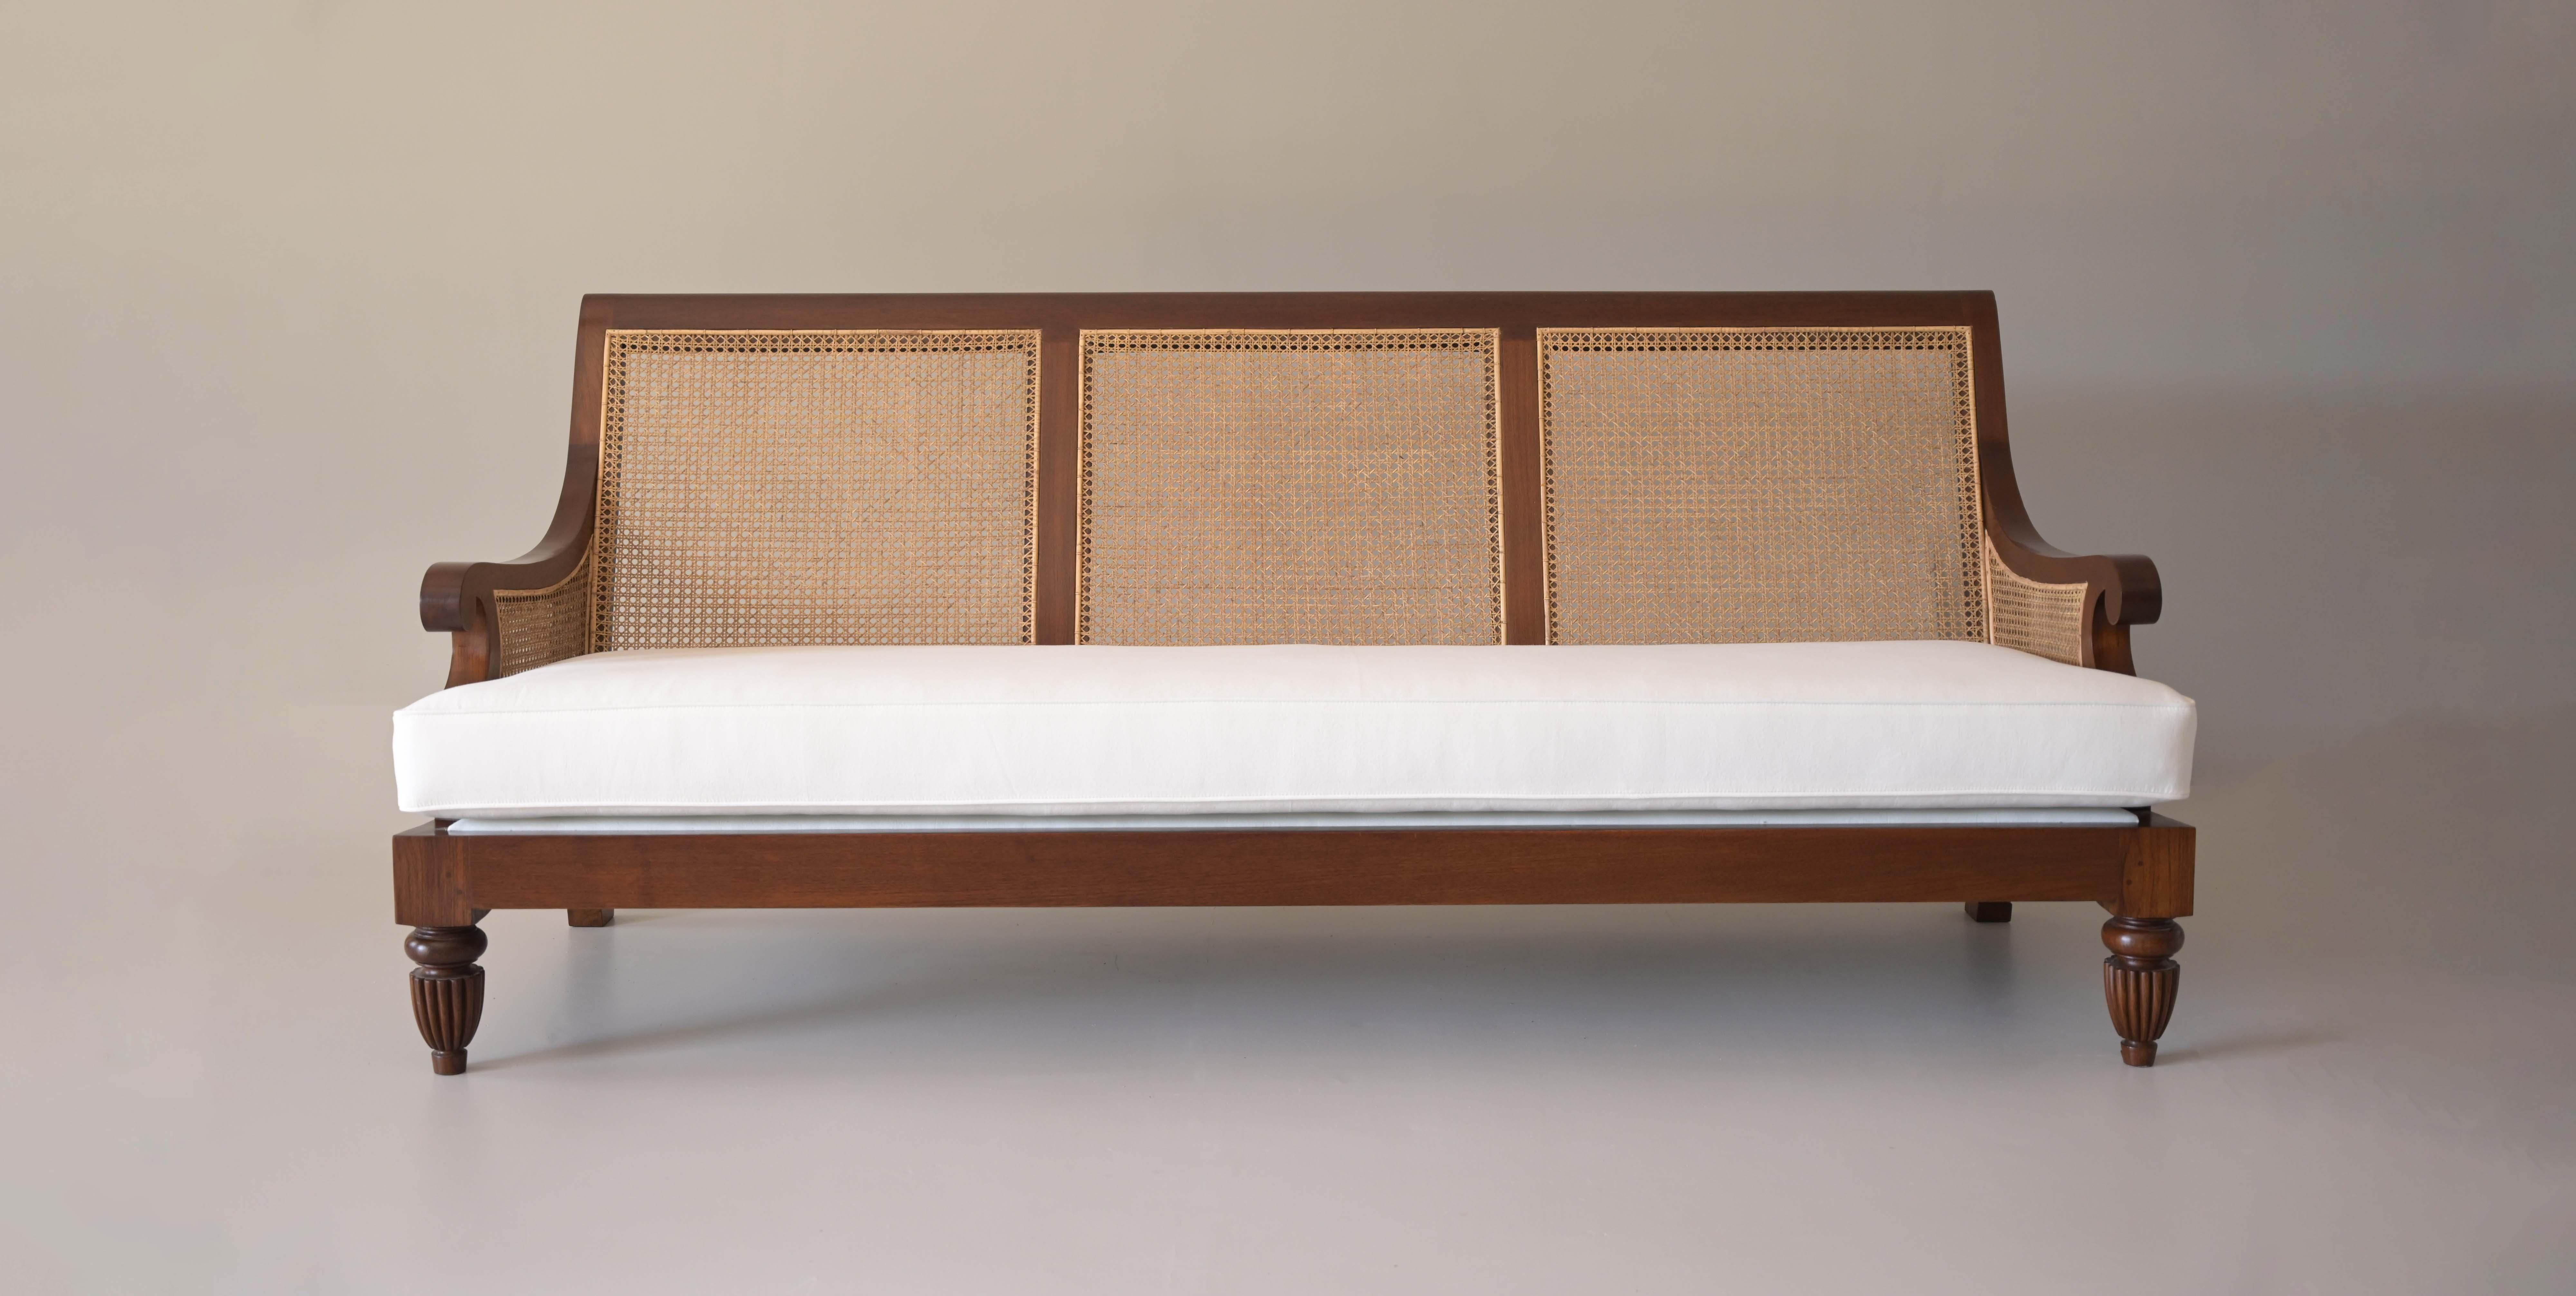 bergere sofa teak wood - fabric upholstered- rattan back